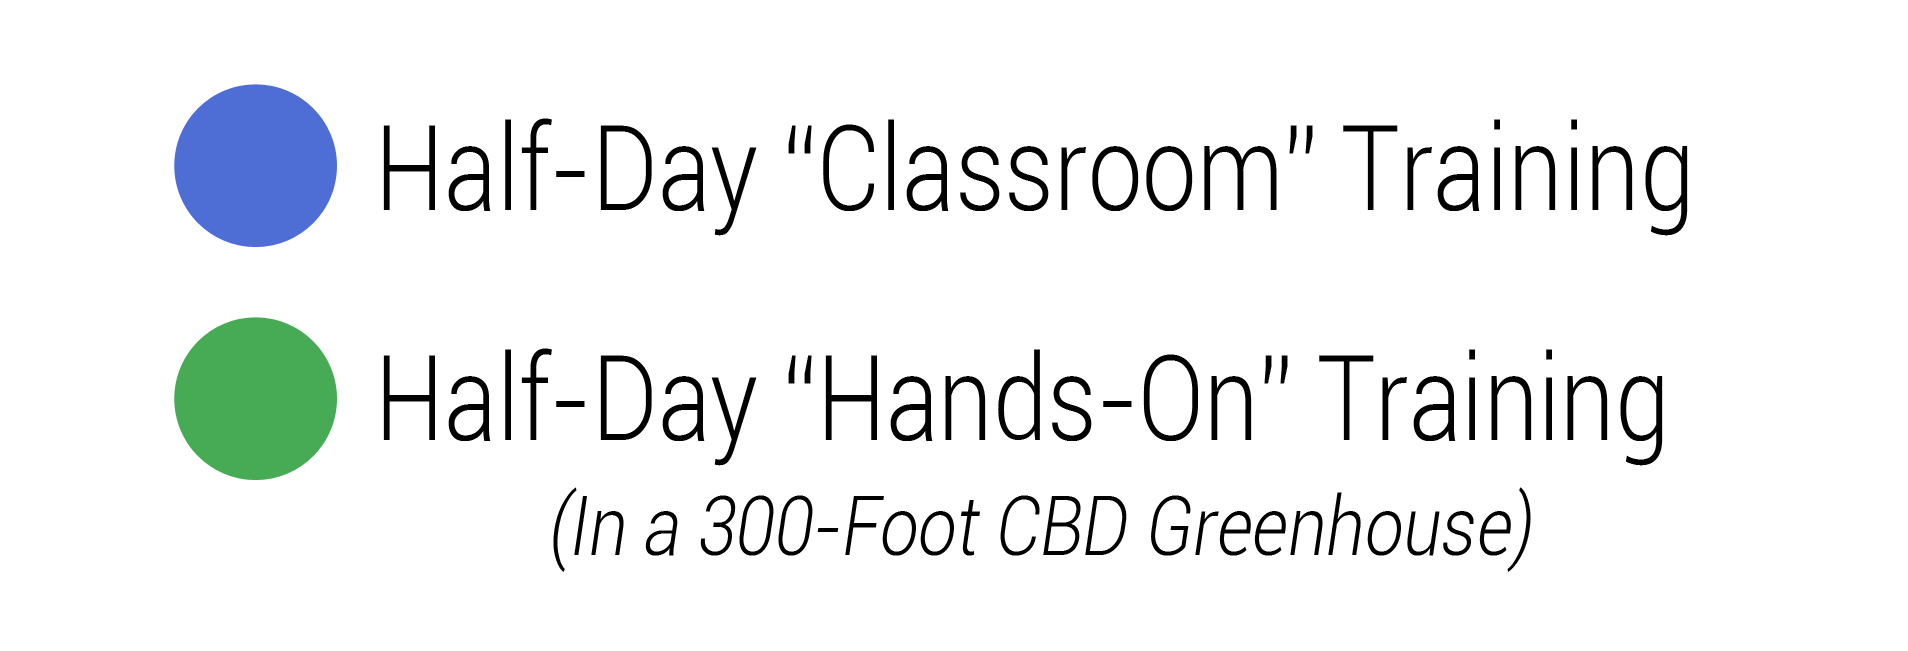 Half Day Classroom